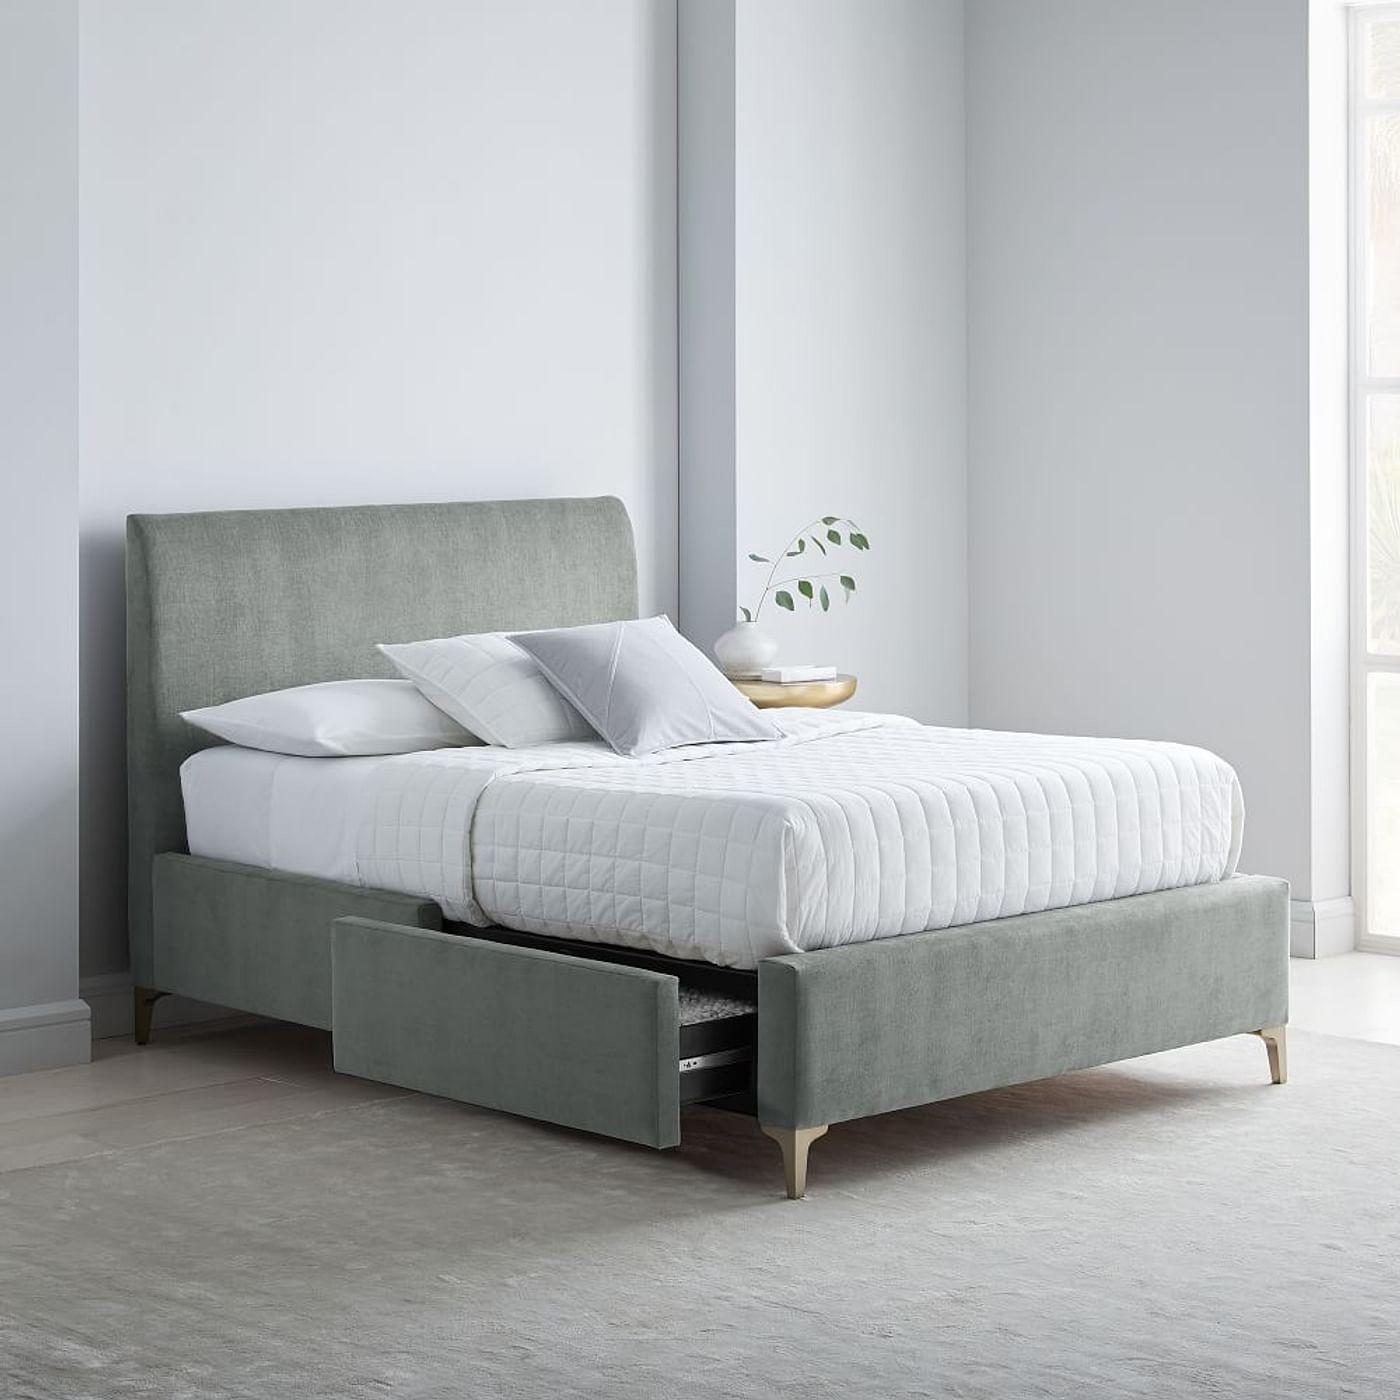 Andes Deco Upholstered Storage Bed